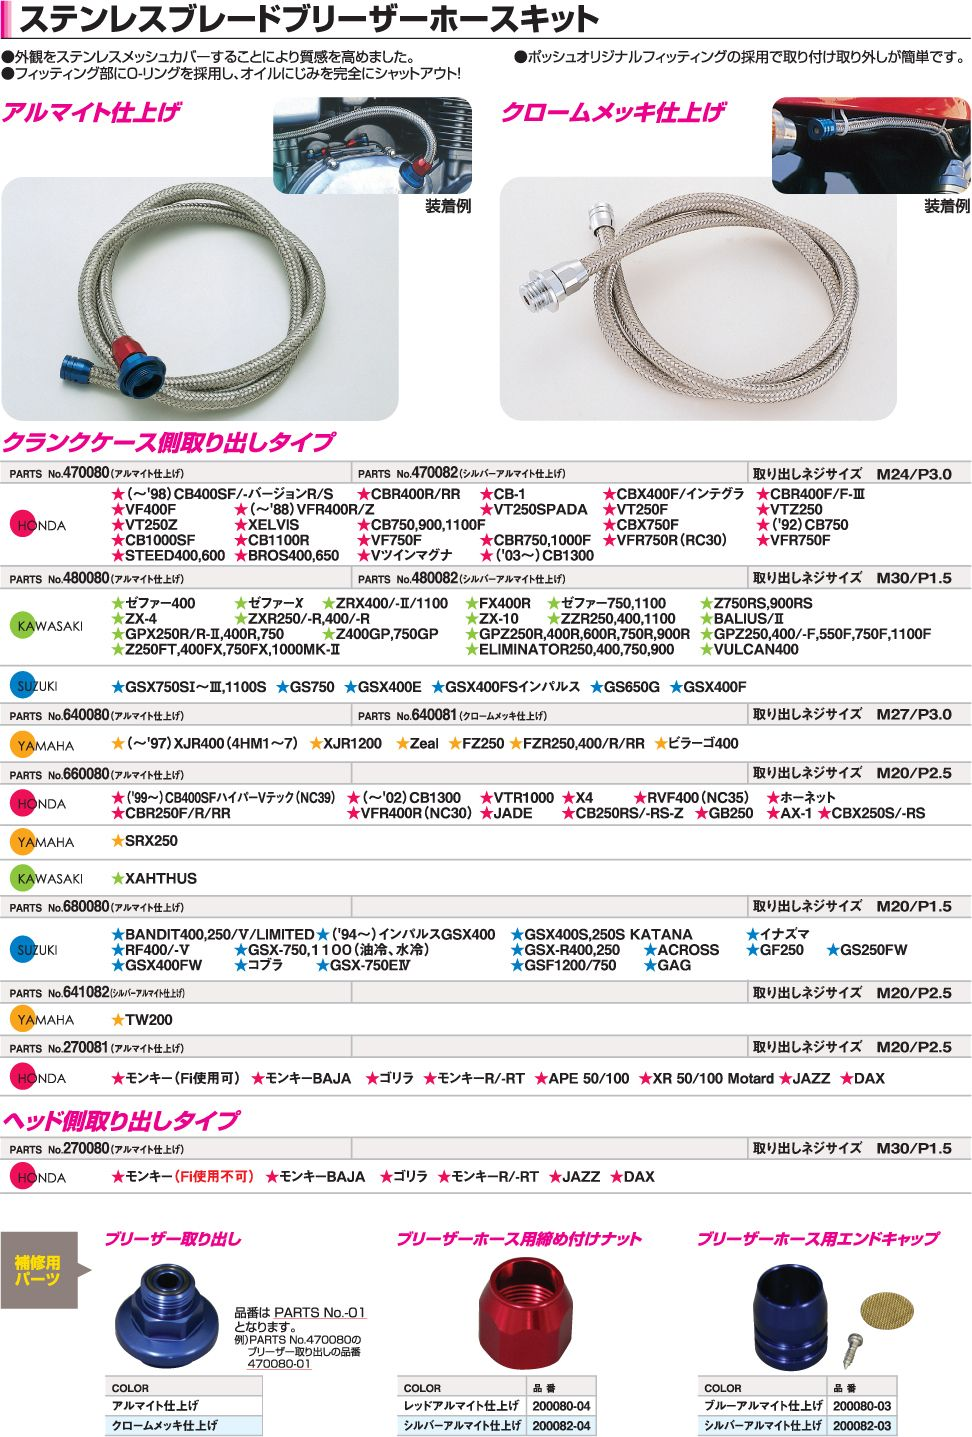 【CF POSH】不銹鋼金屬通氣管套件 - 「Webike-摩托百貨」